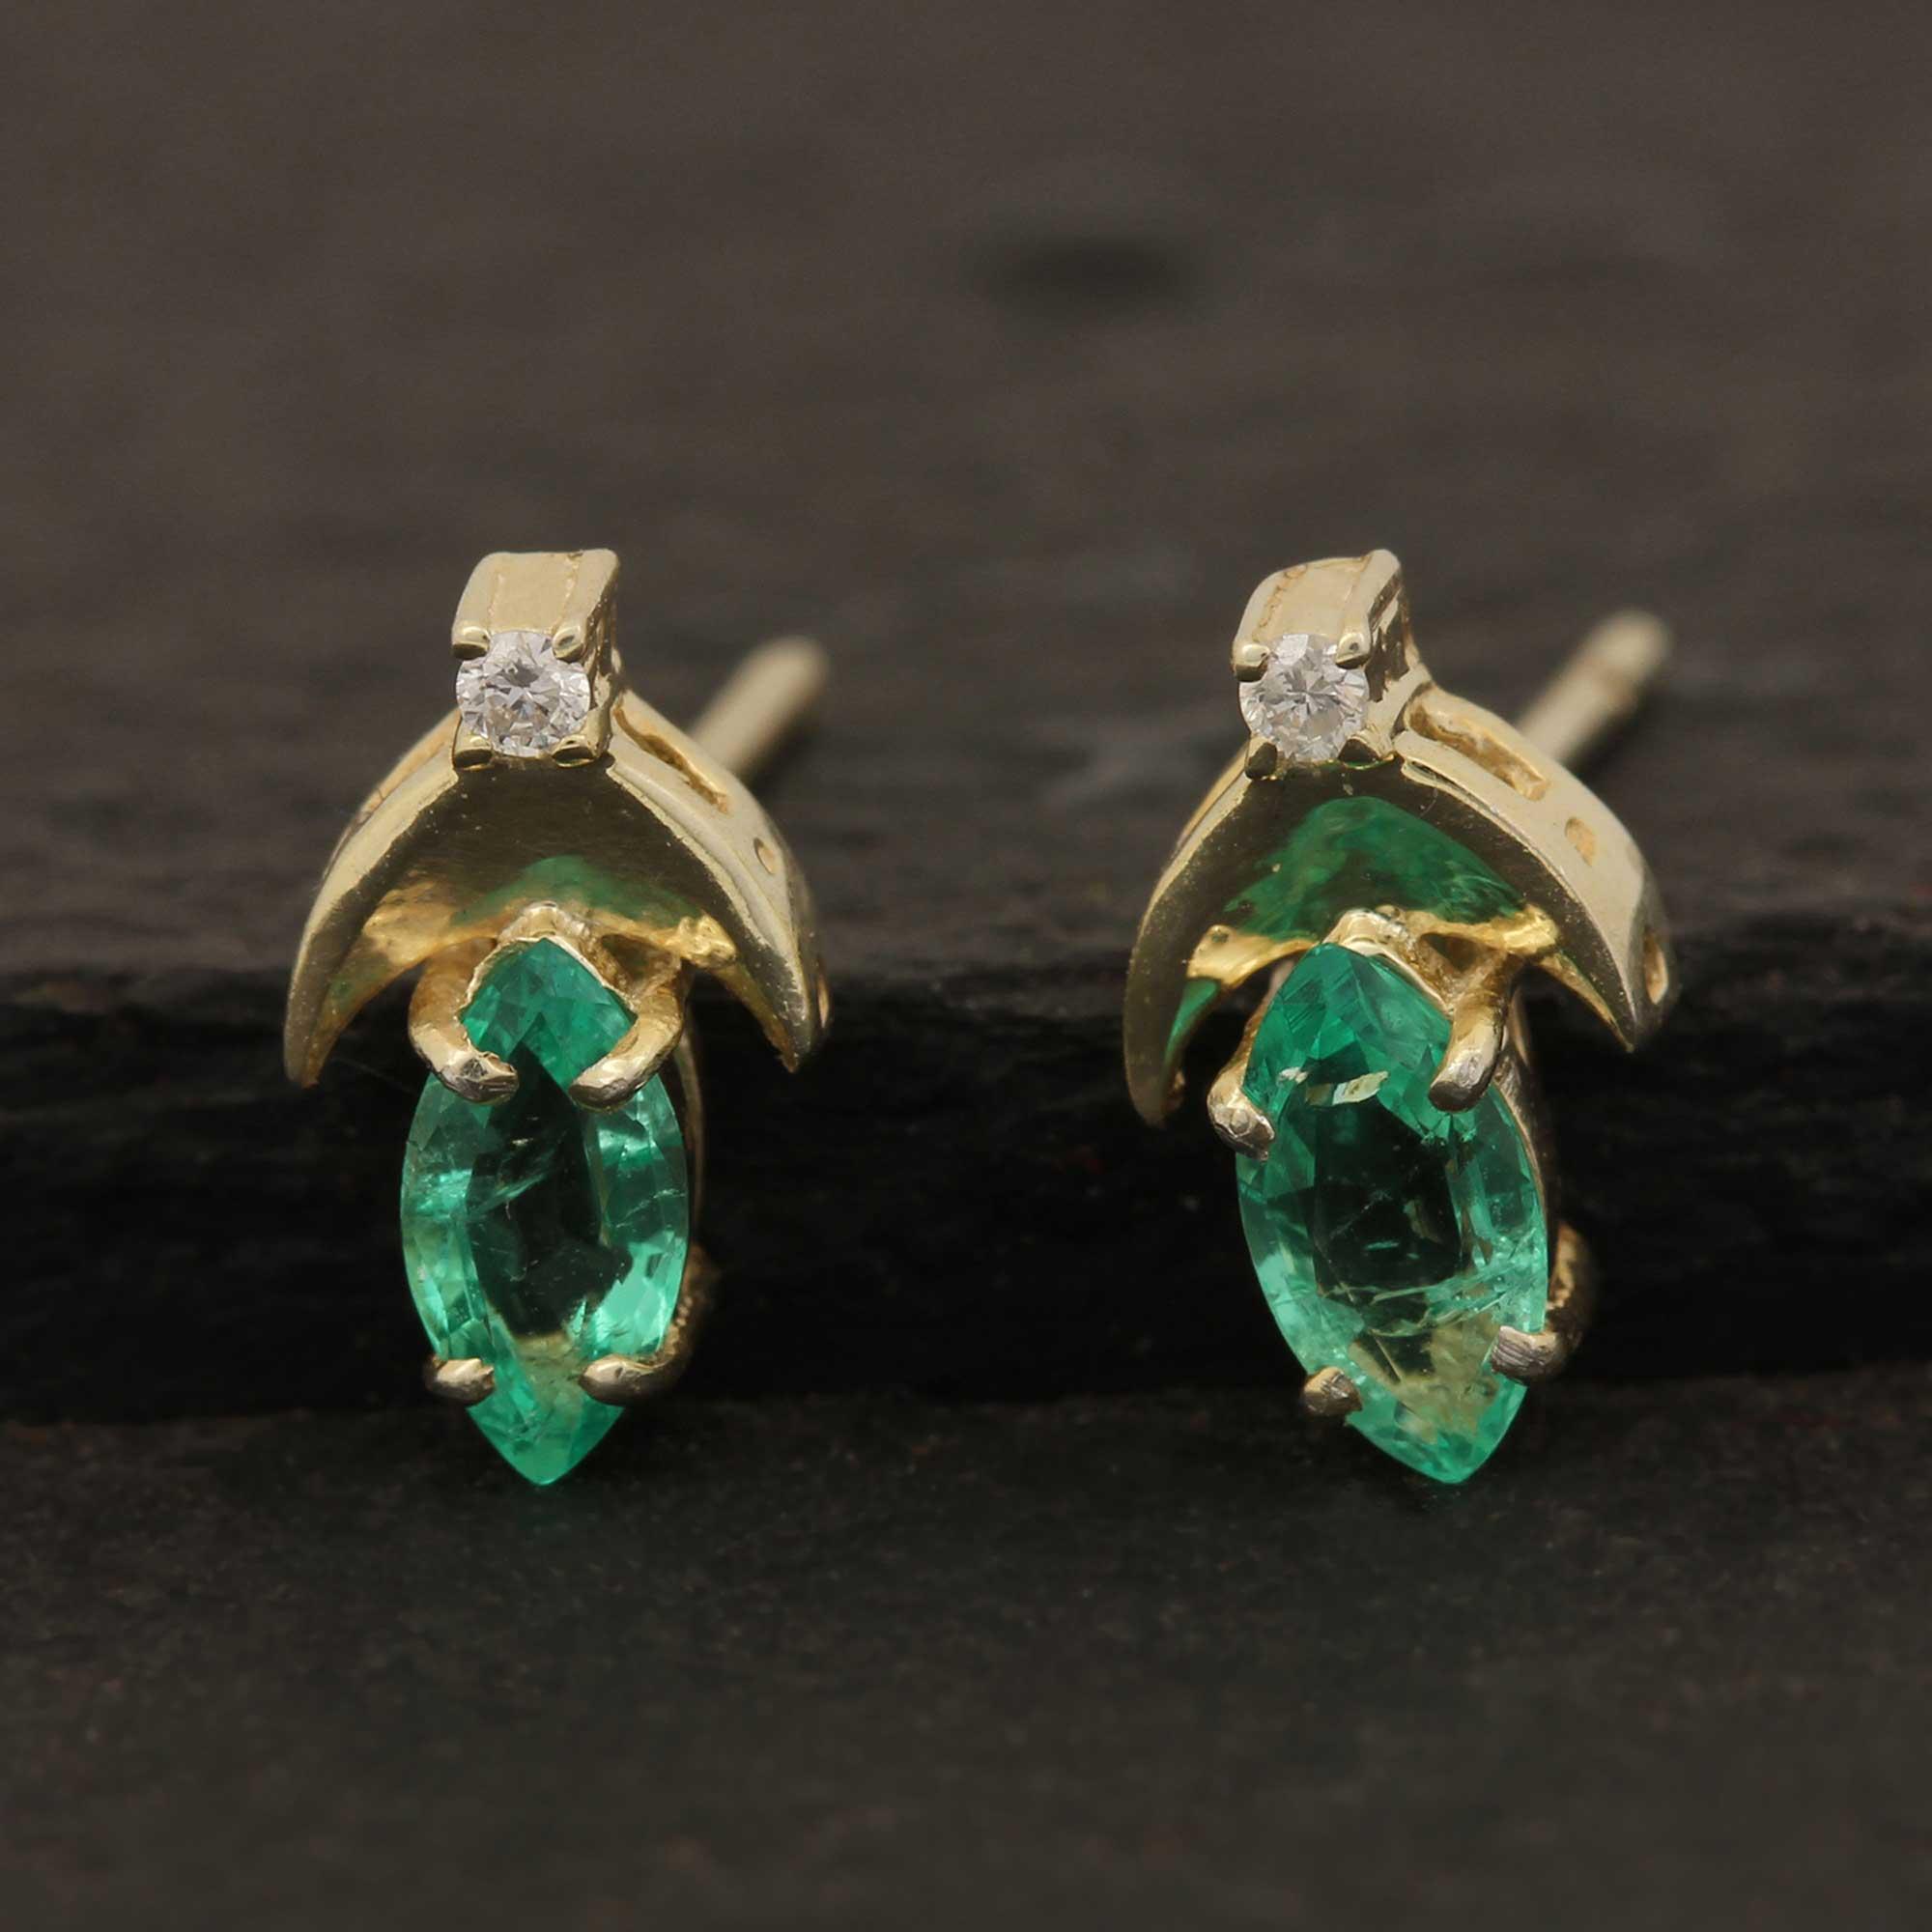 14k Solid Gold Diamond Natural Emerald Gemstone Stud Earrings